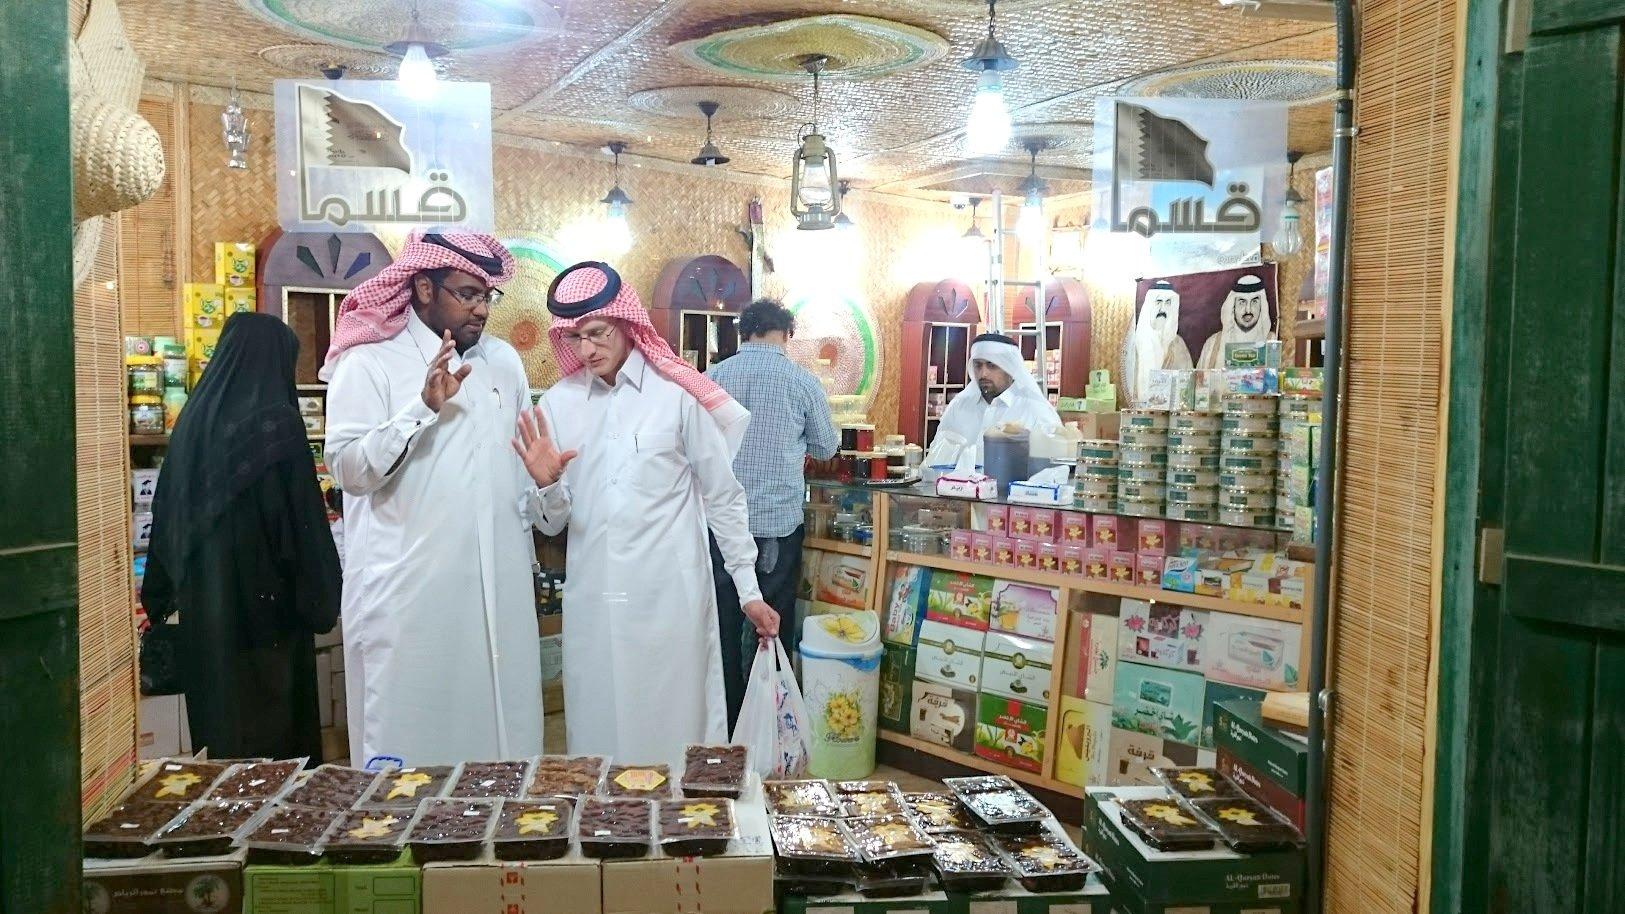 Souq Waqif Doha Qatar välilasku